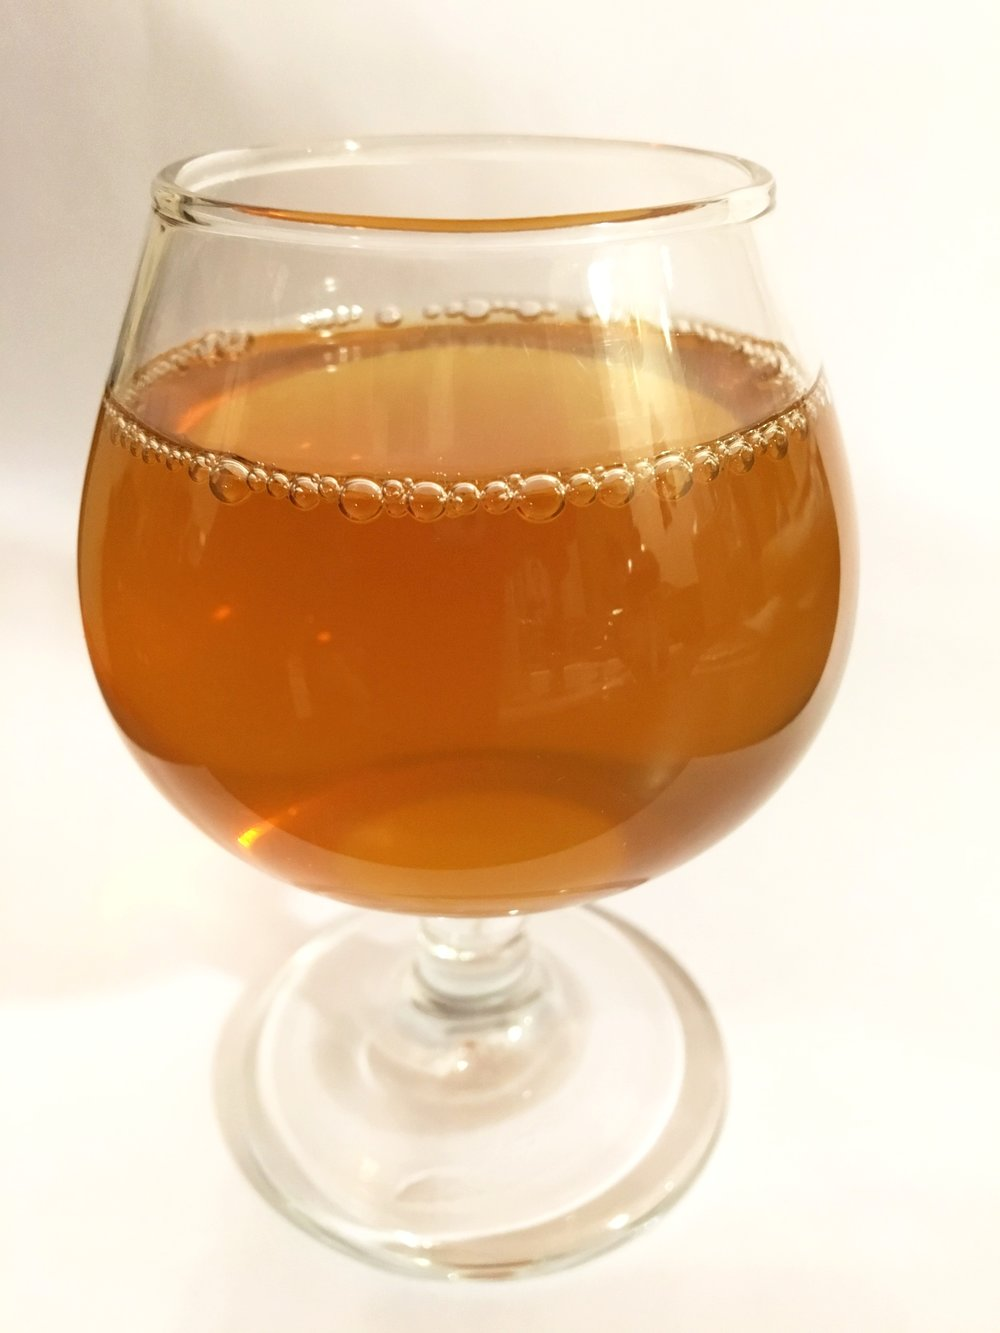 Wisconsin Russet Cider